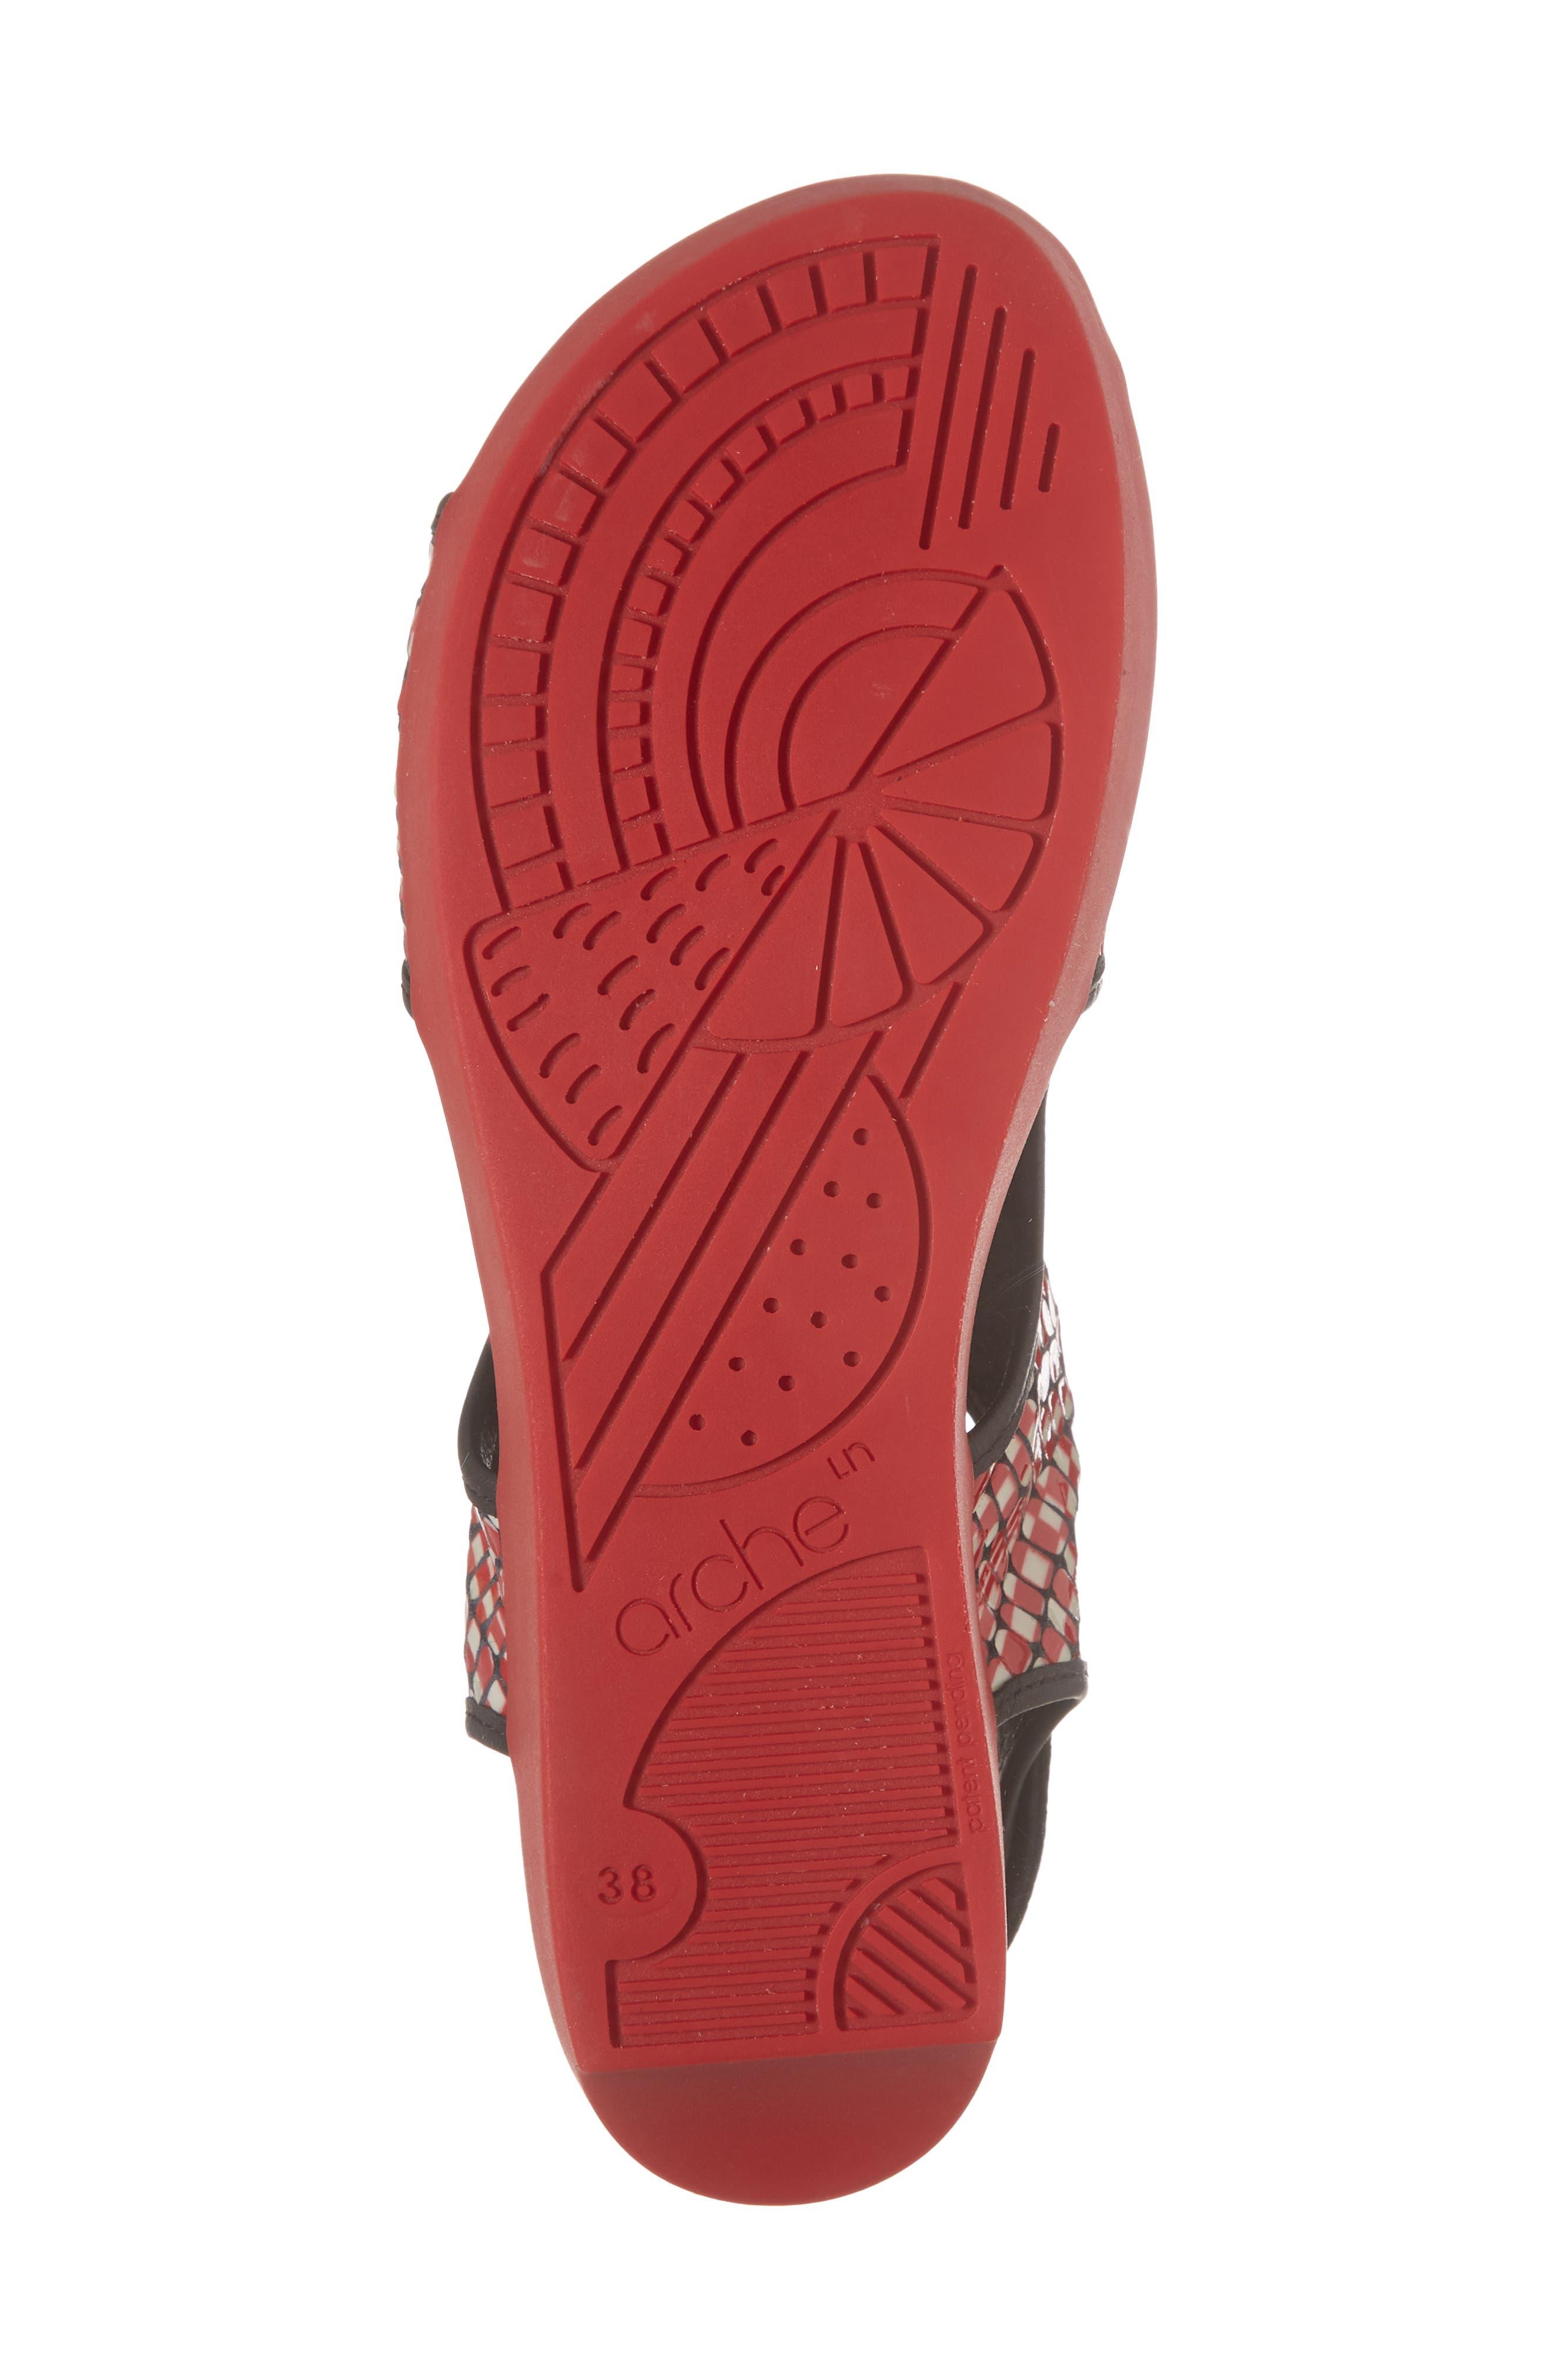 Naka Popa Wedge Sandal,                             Alternate thumbnail 6, color,                             Noir/ Rosso Leather